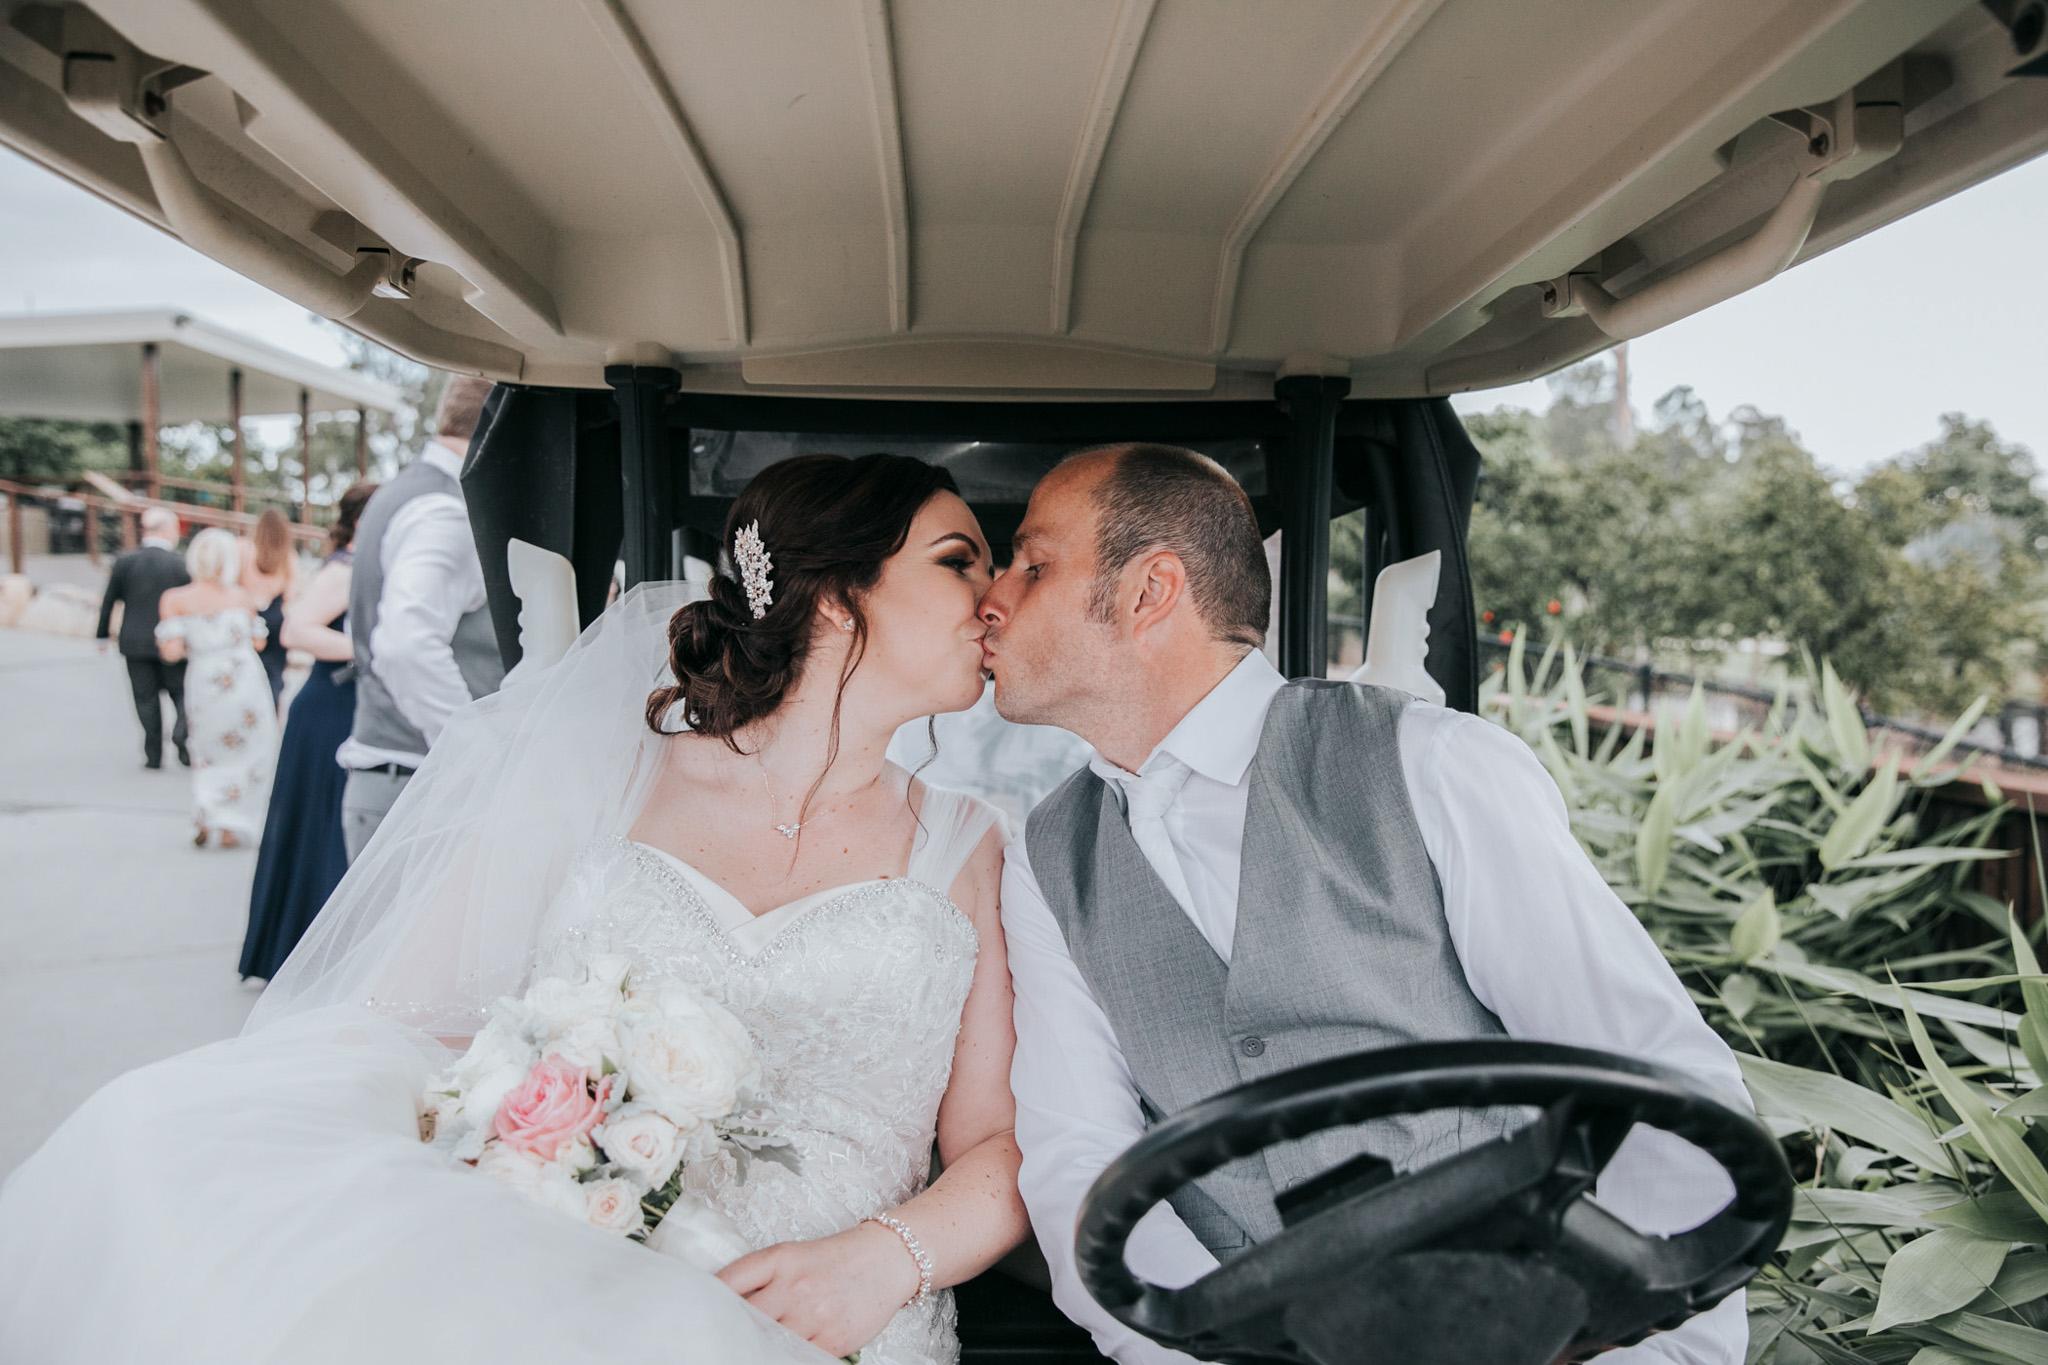 JO + MICHAEL - Parkwood Wedding Venue, Gold Coast